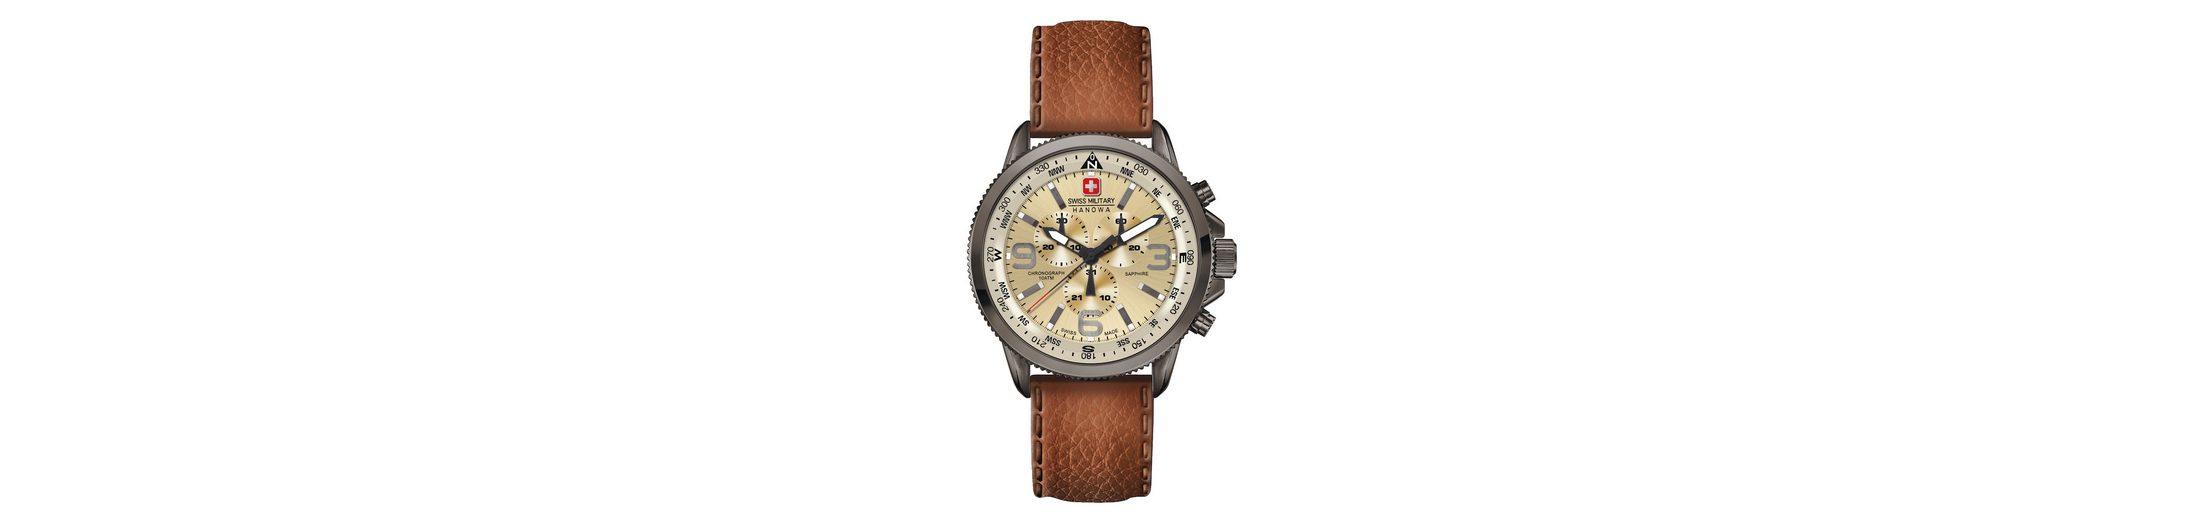 "Swiss Military Hanowa, Chronograph, ""ARROW CHRONO, 06-4224.30.002"""